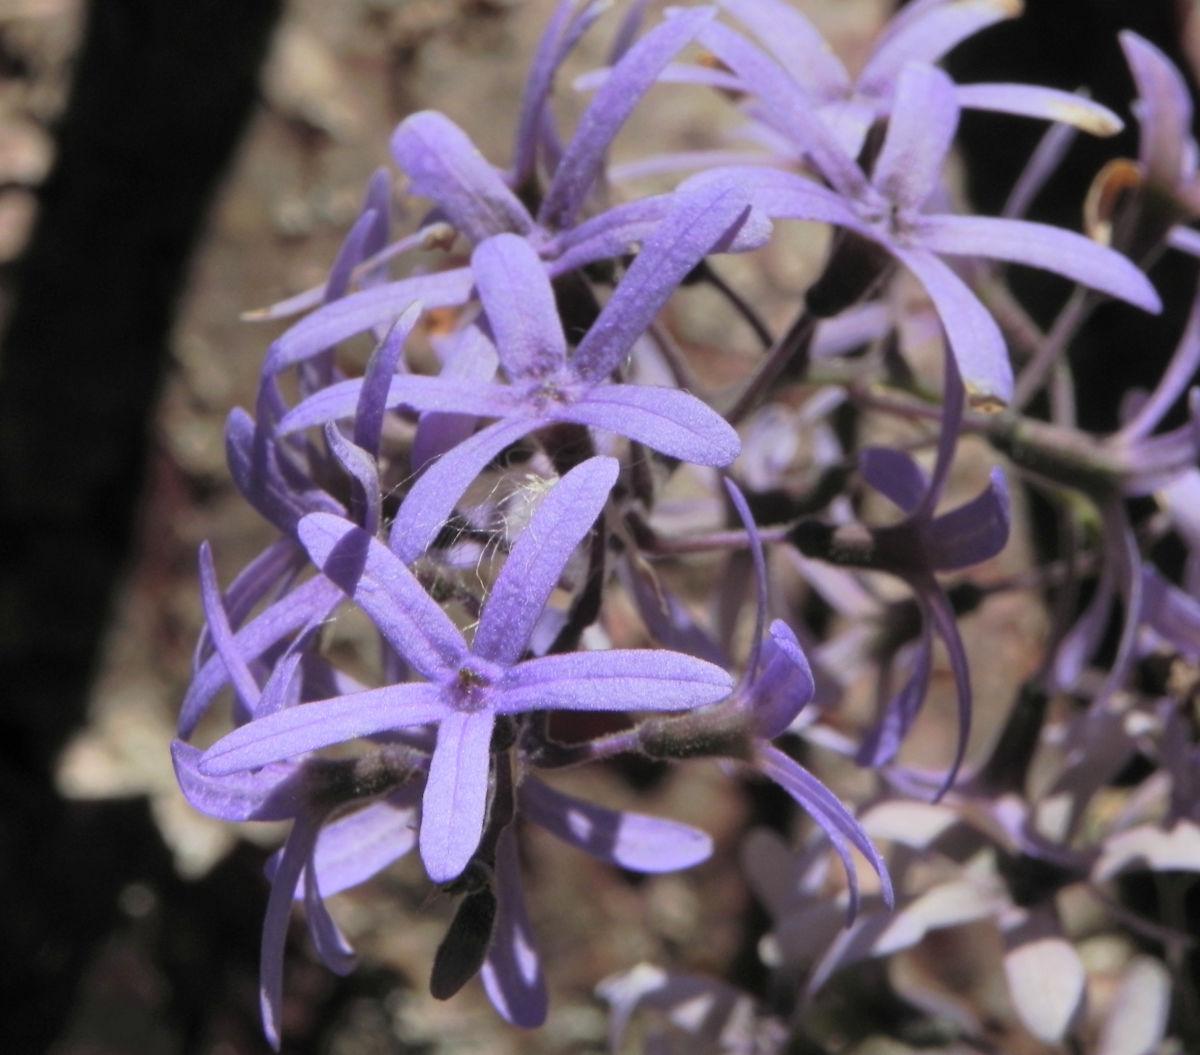 Purpurkranz Blüte blau Petrea subserrata